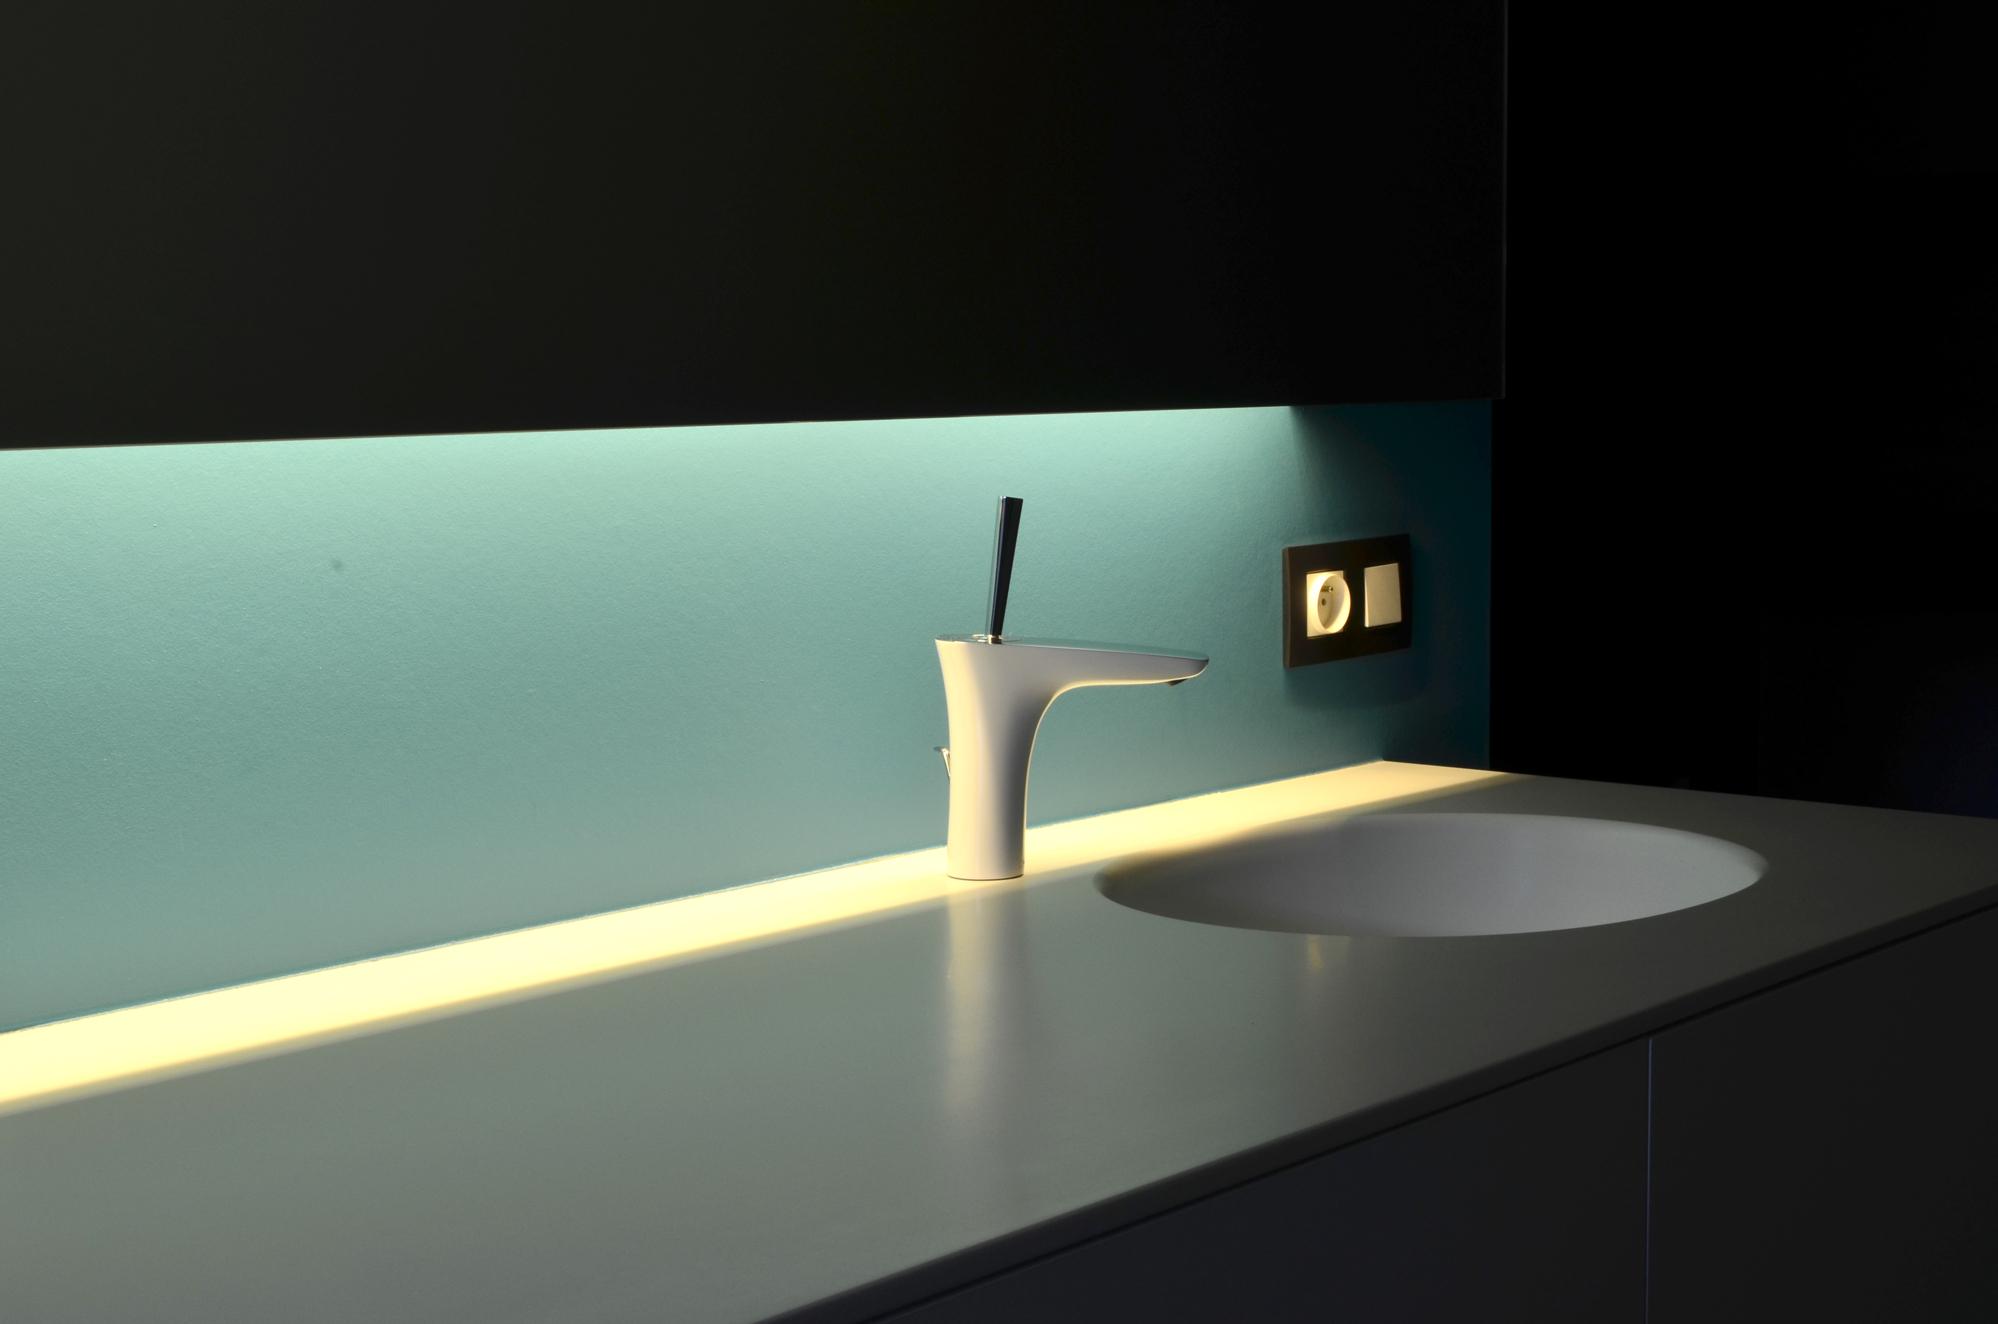 Corian Badkamer Wanden : Corian badkamer. corian badkamer wanden goedkoop corian badkamer